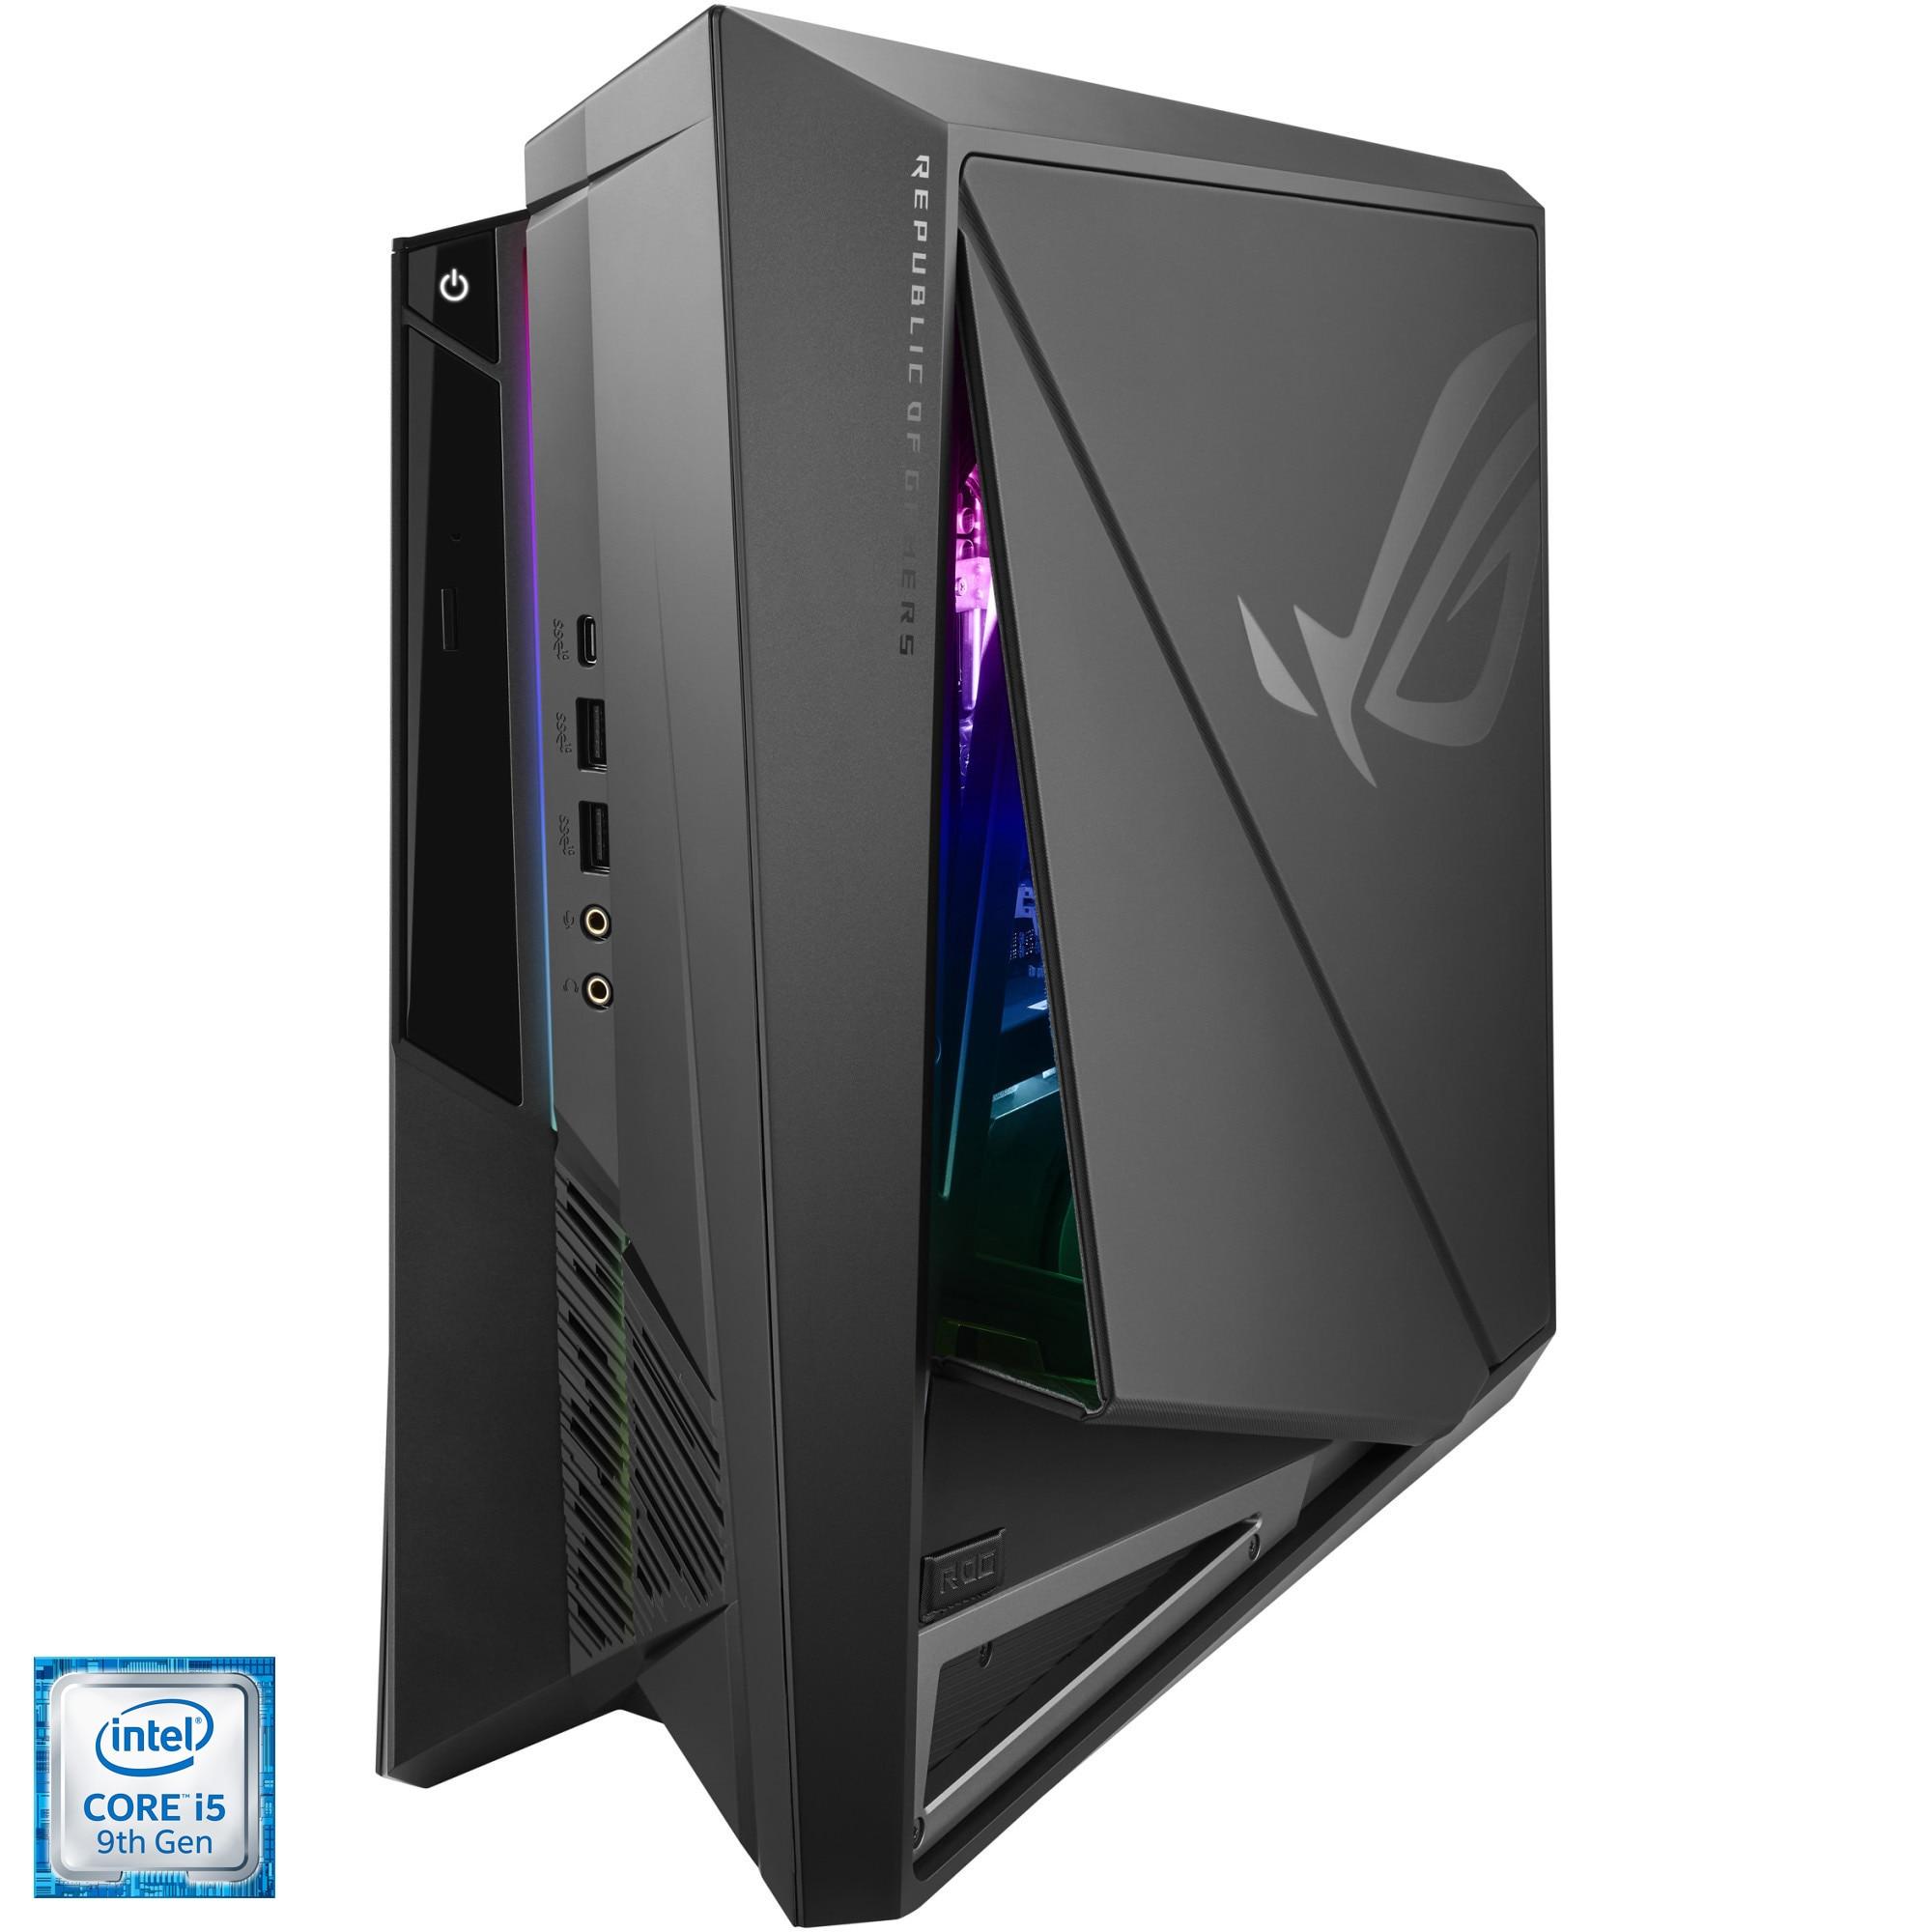 Fotografie Sistem Gaming ASUS ROG Huracan G21CX cu procesor Intel® Core™ i5-9400F pana la 4.10 GHz, Coffee Lake, 16GB DDR4, 1TB SSD M.2 NVMe™, NVIDIA® GeForce® RTX 2060 SUPER 8GB, No OS